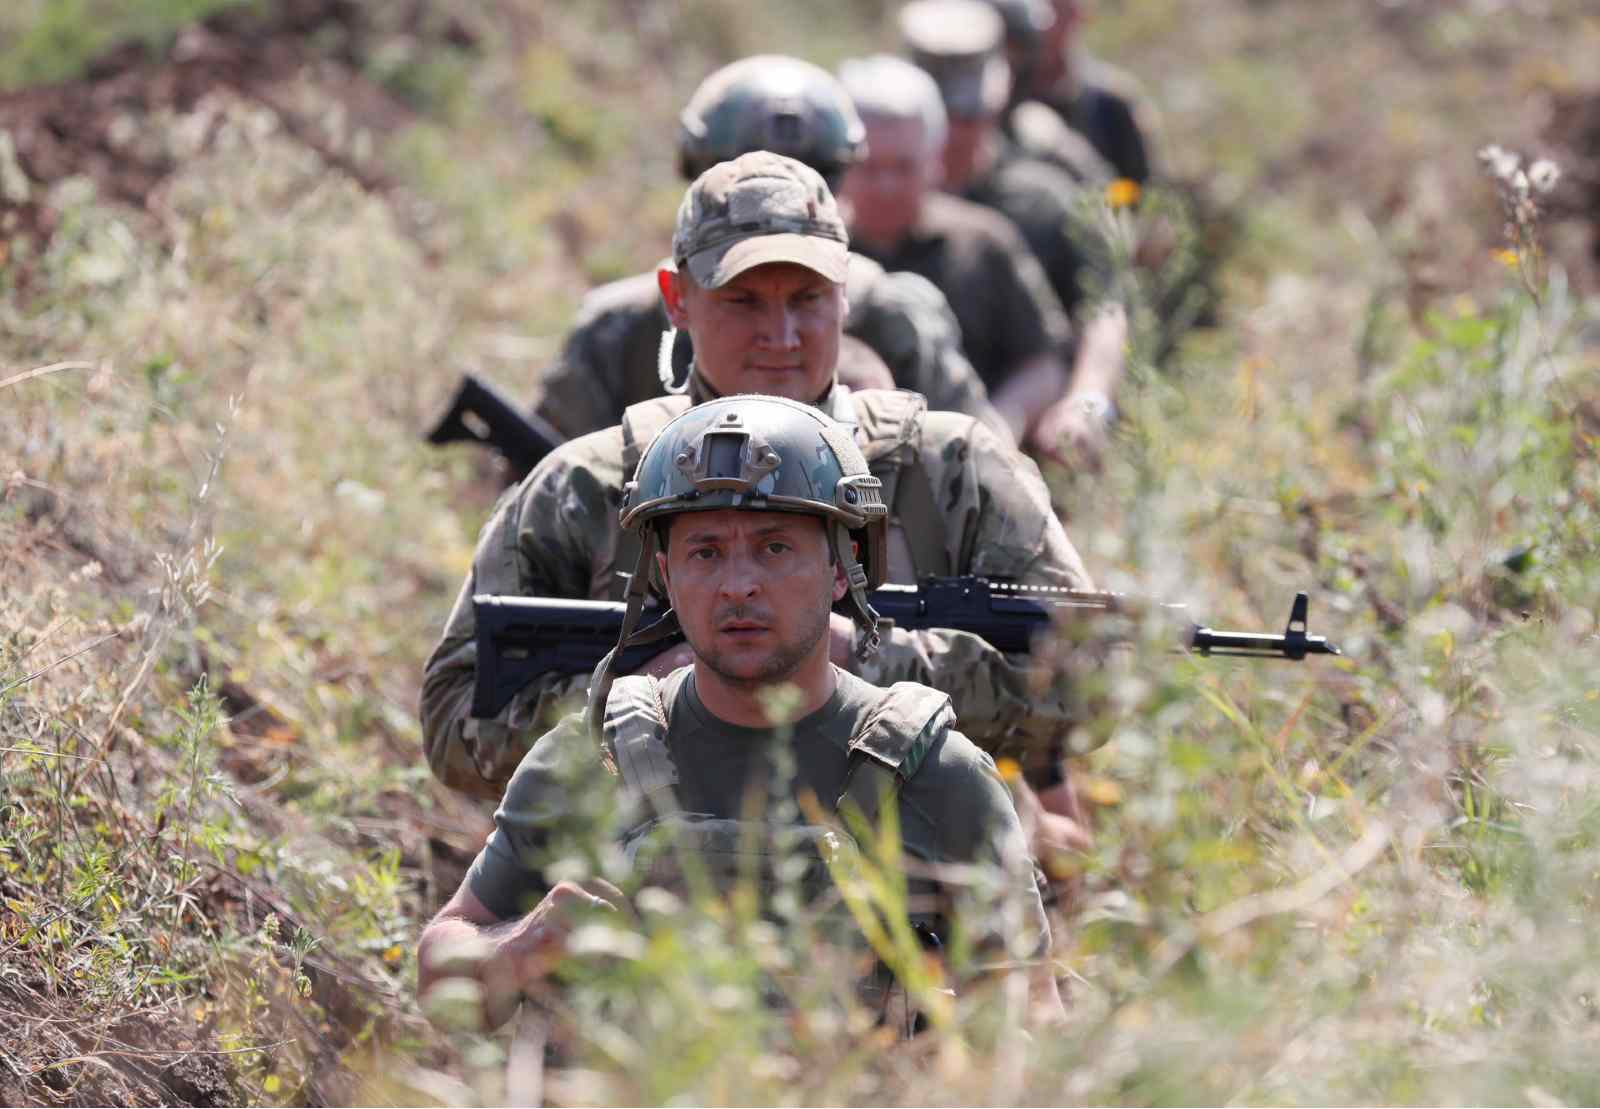 Ukraine's President Volodymyr Zelenskiy and servicemen walk in a trench near the frontline with Russian-backed separatists in Krasnohorivka in Donetsk Region, Ukraine August 7, 2020.